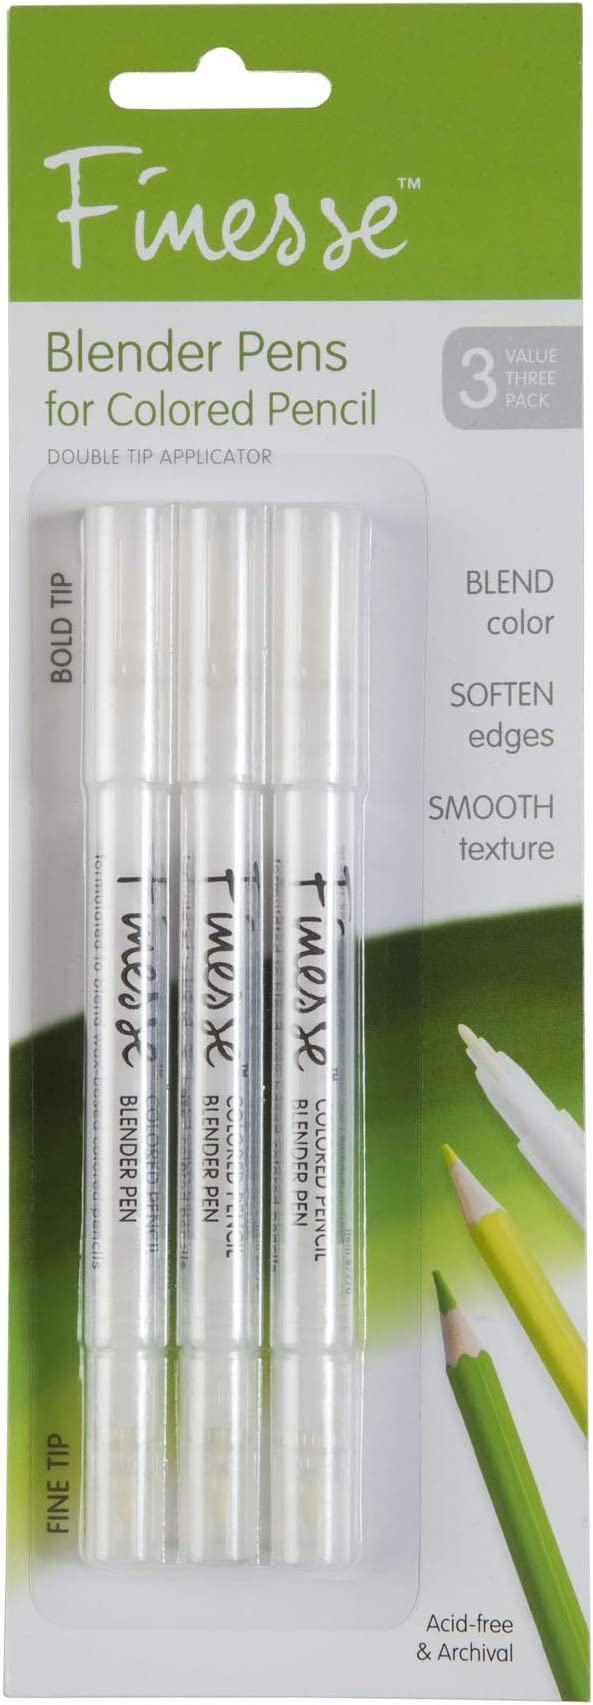 Finesse Blender Pen For Colored Pencils